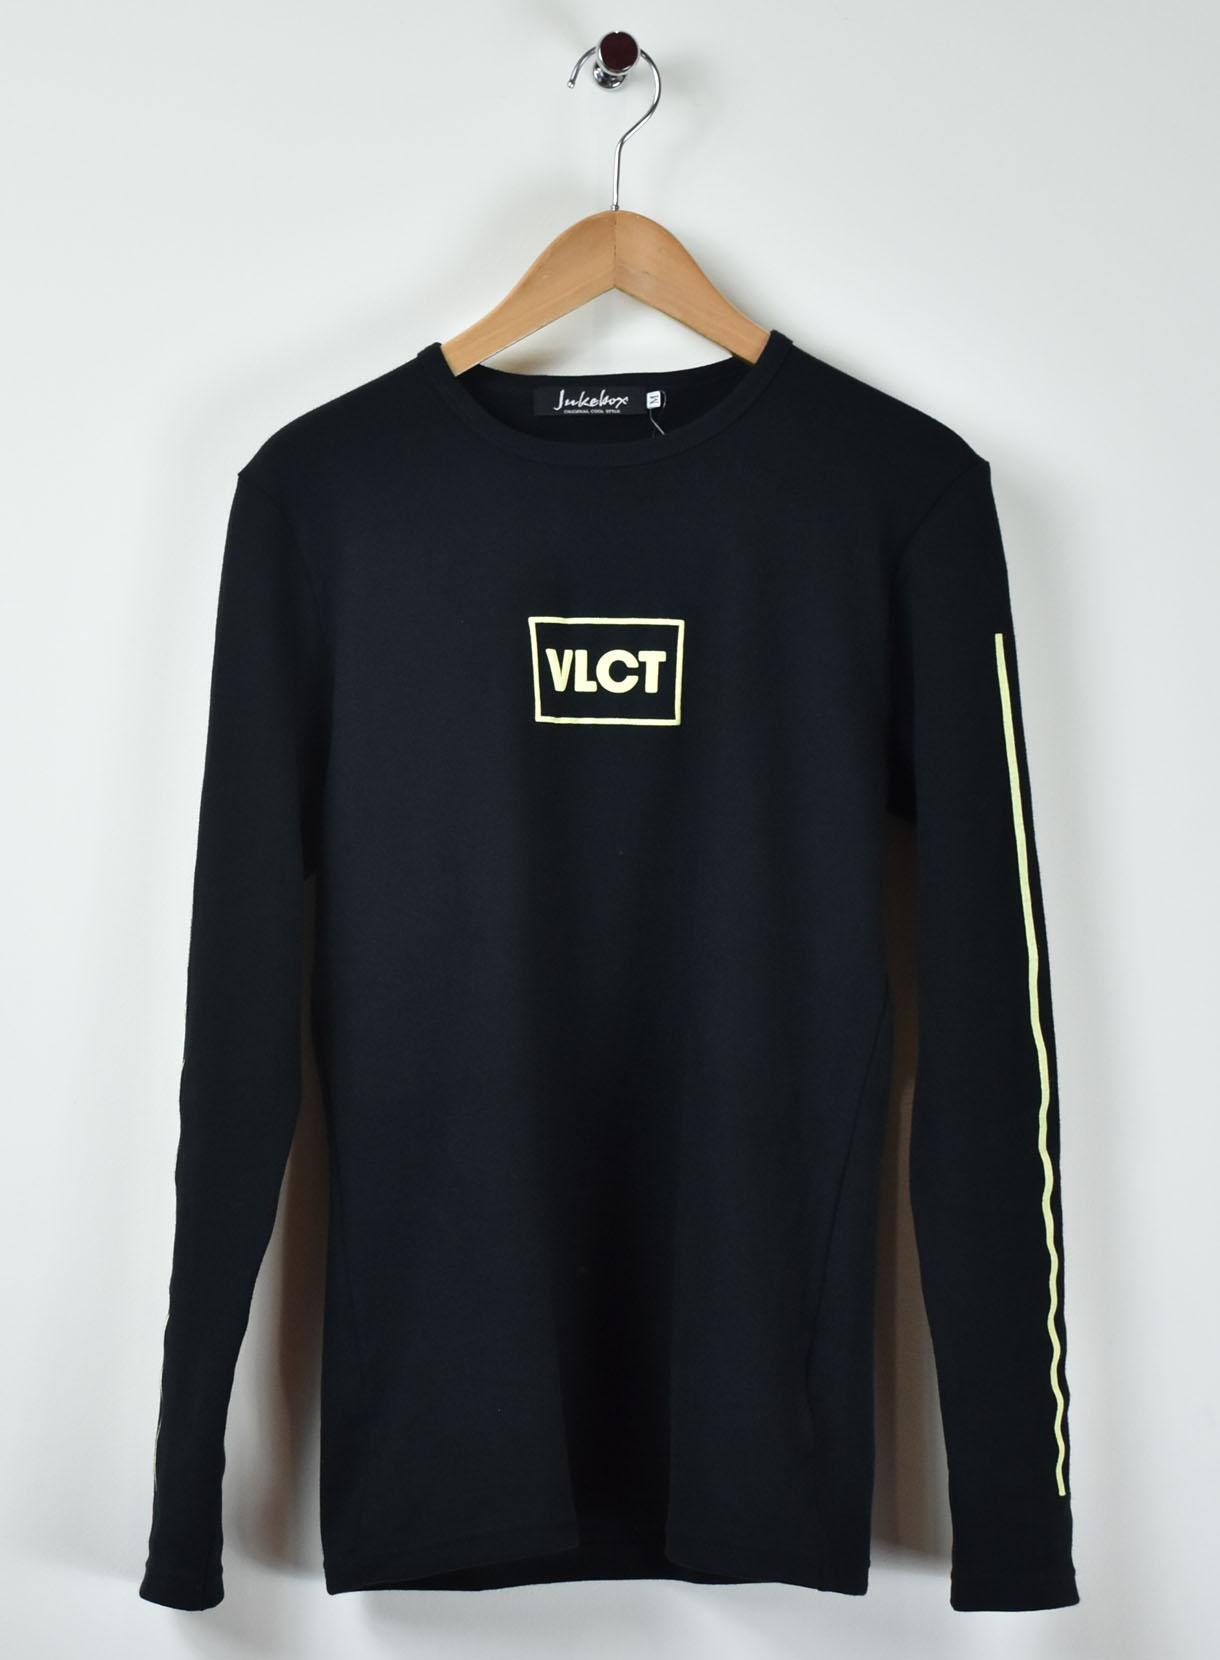 JUKEBOX 国産スムースTシャツ(VLCT)